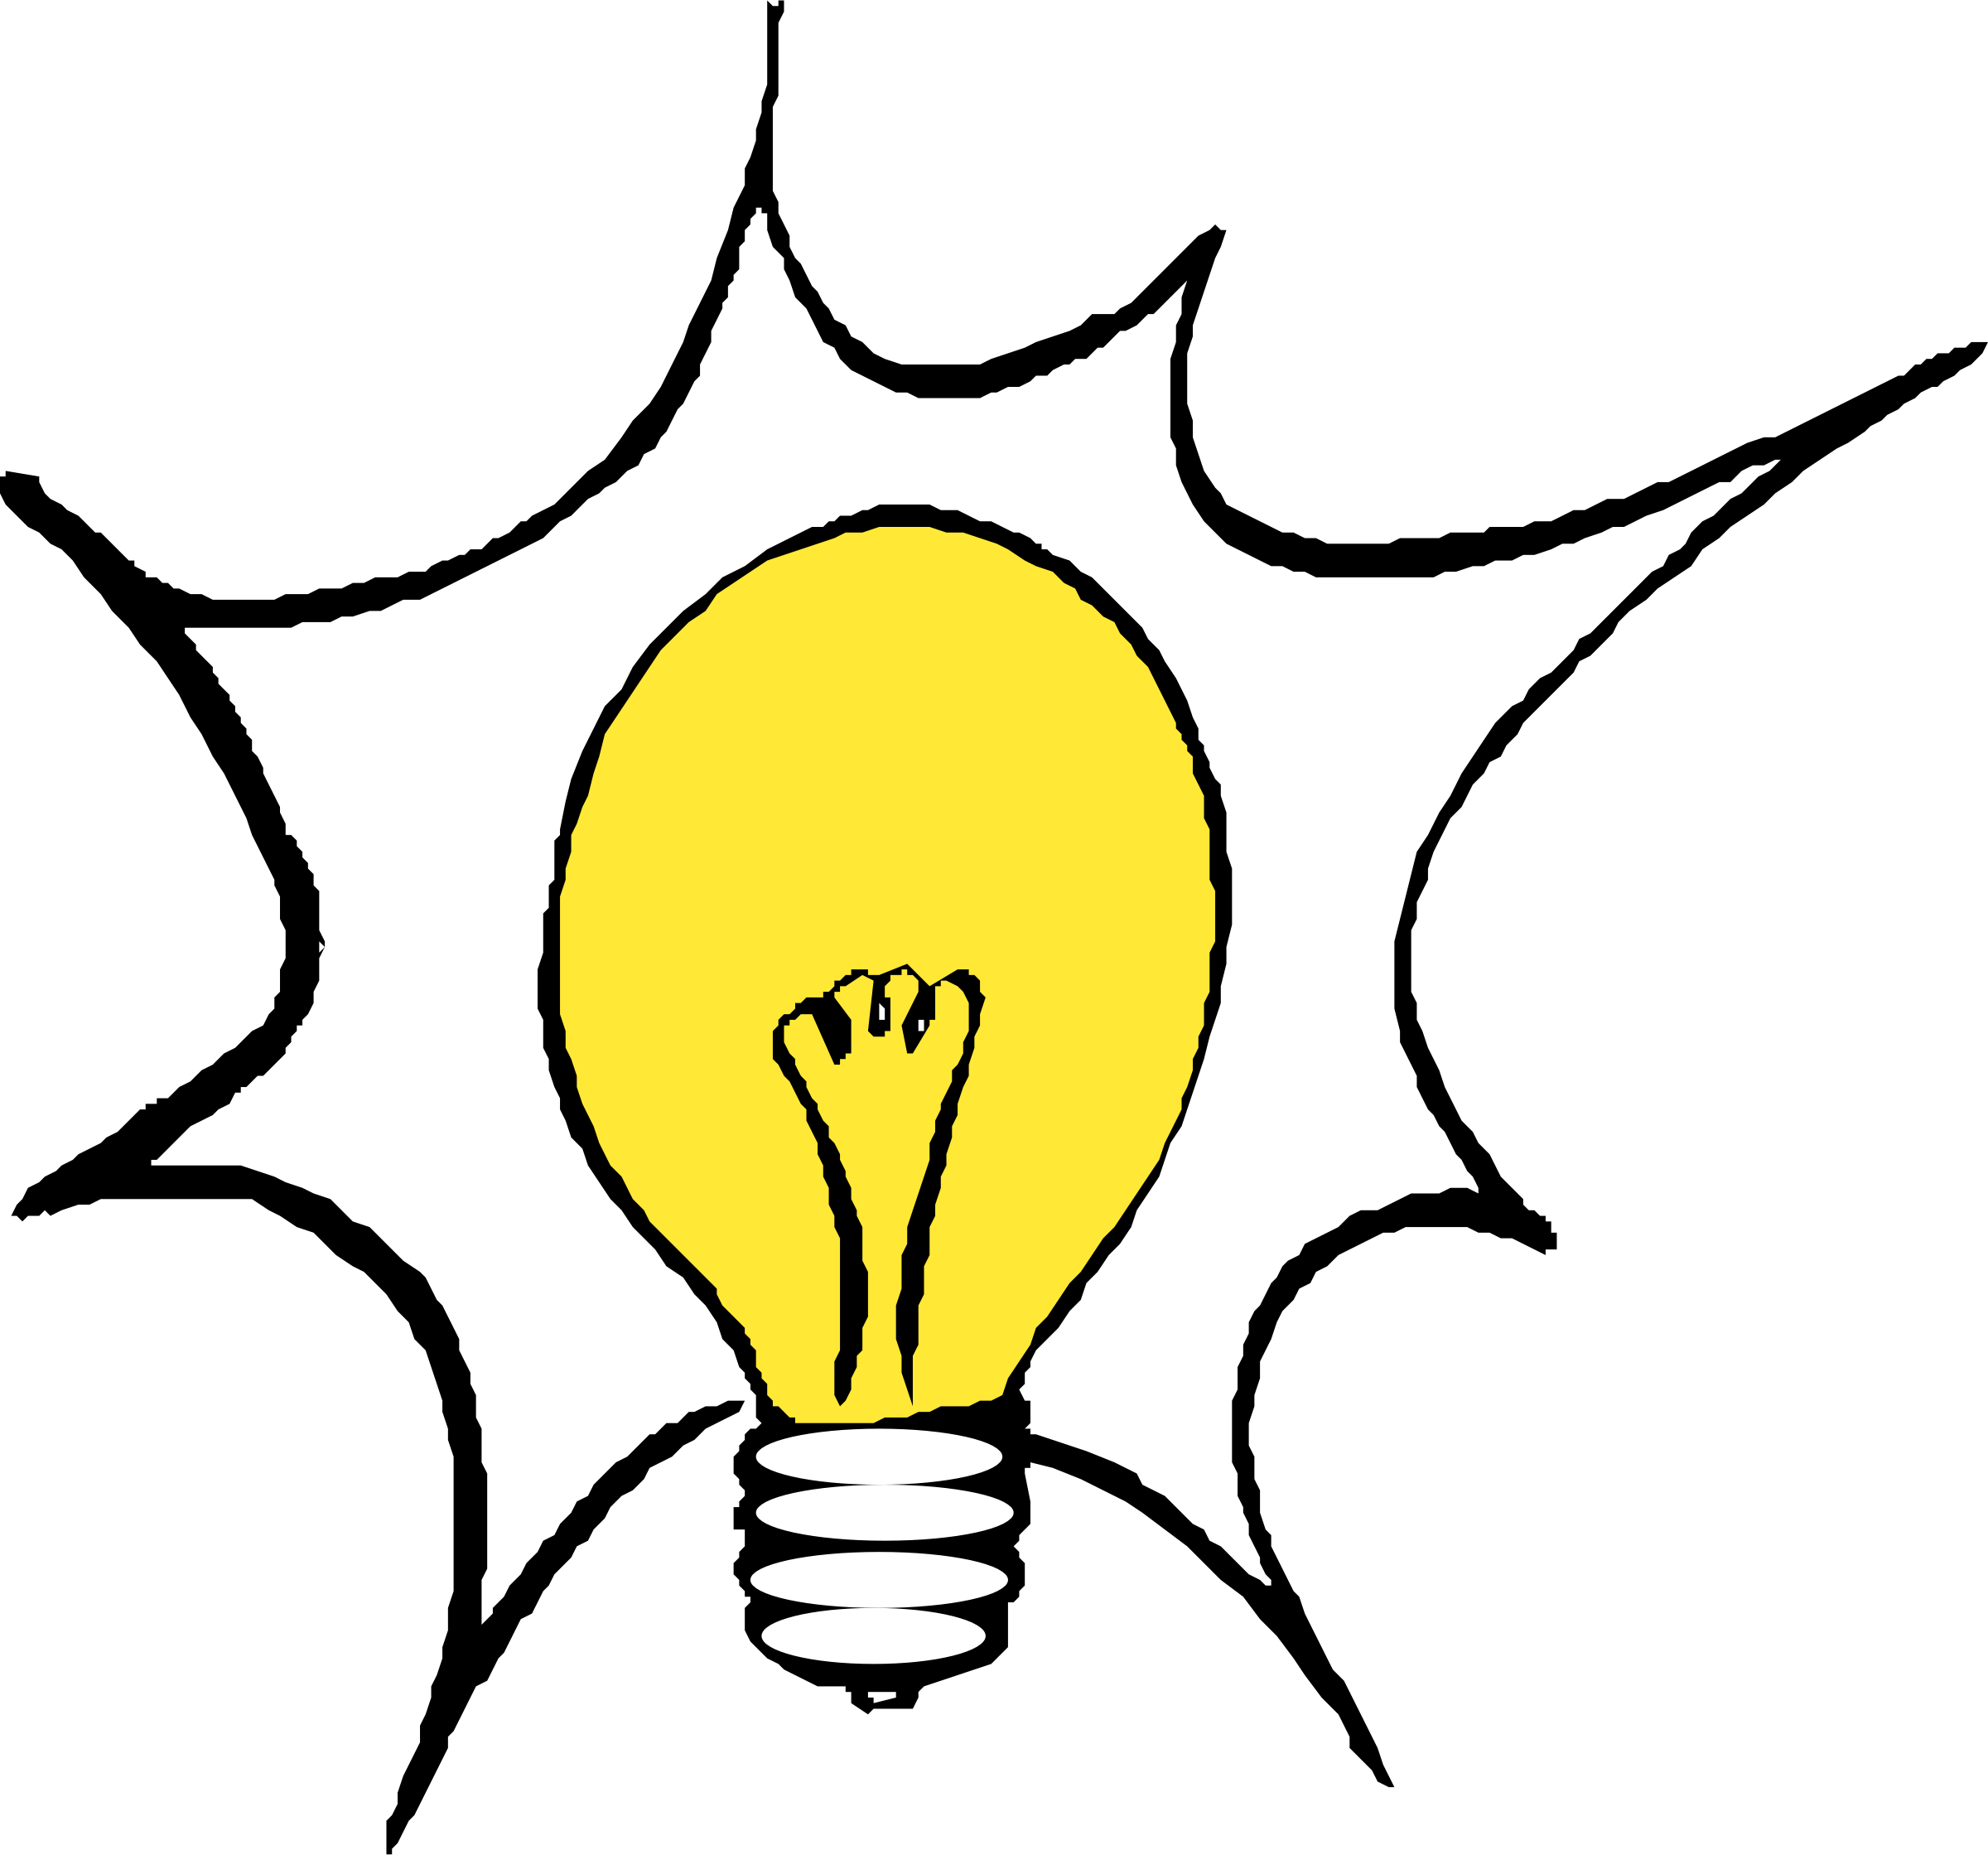 Lamps clipart source light Light Bulb 16 – Clipart